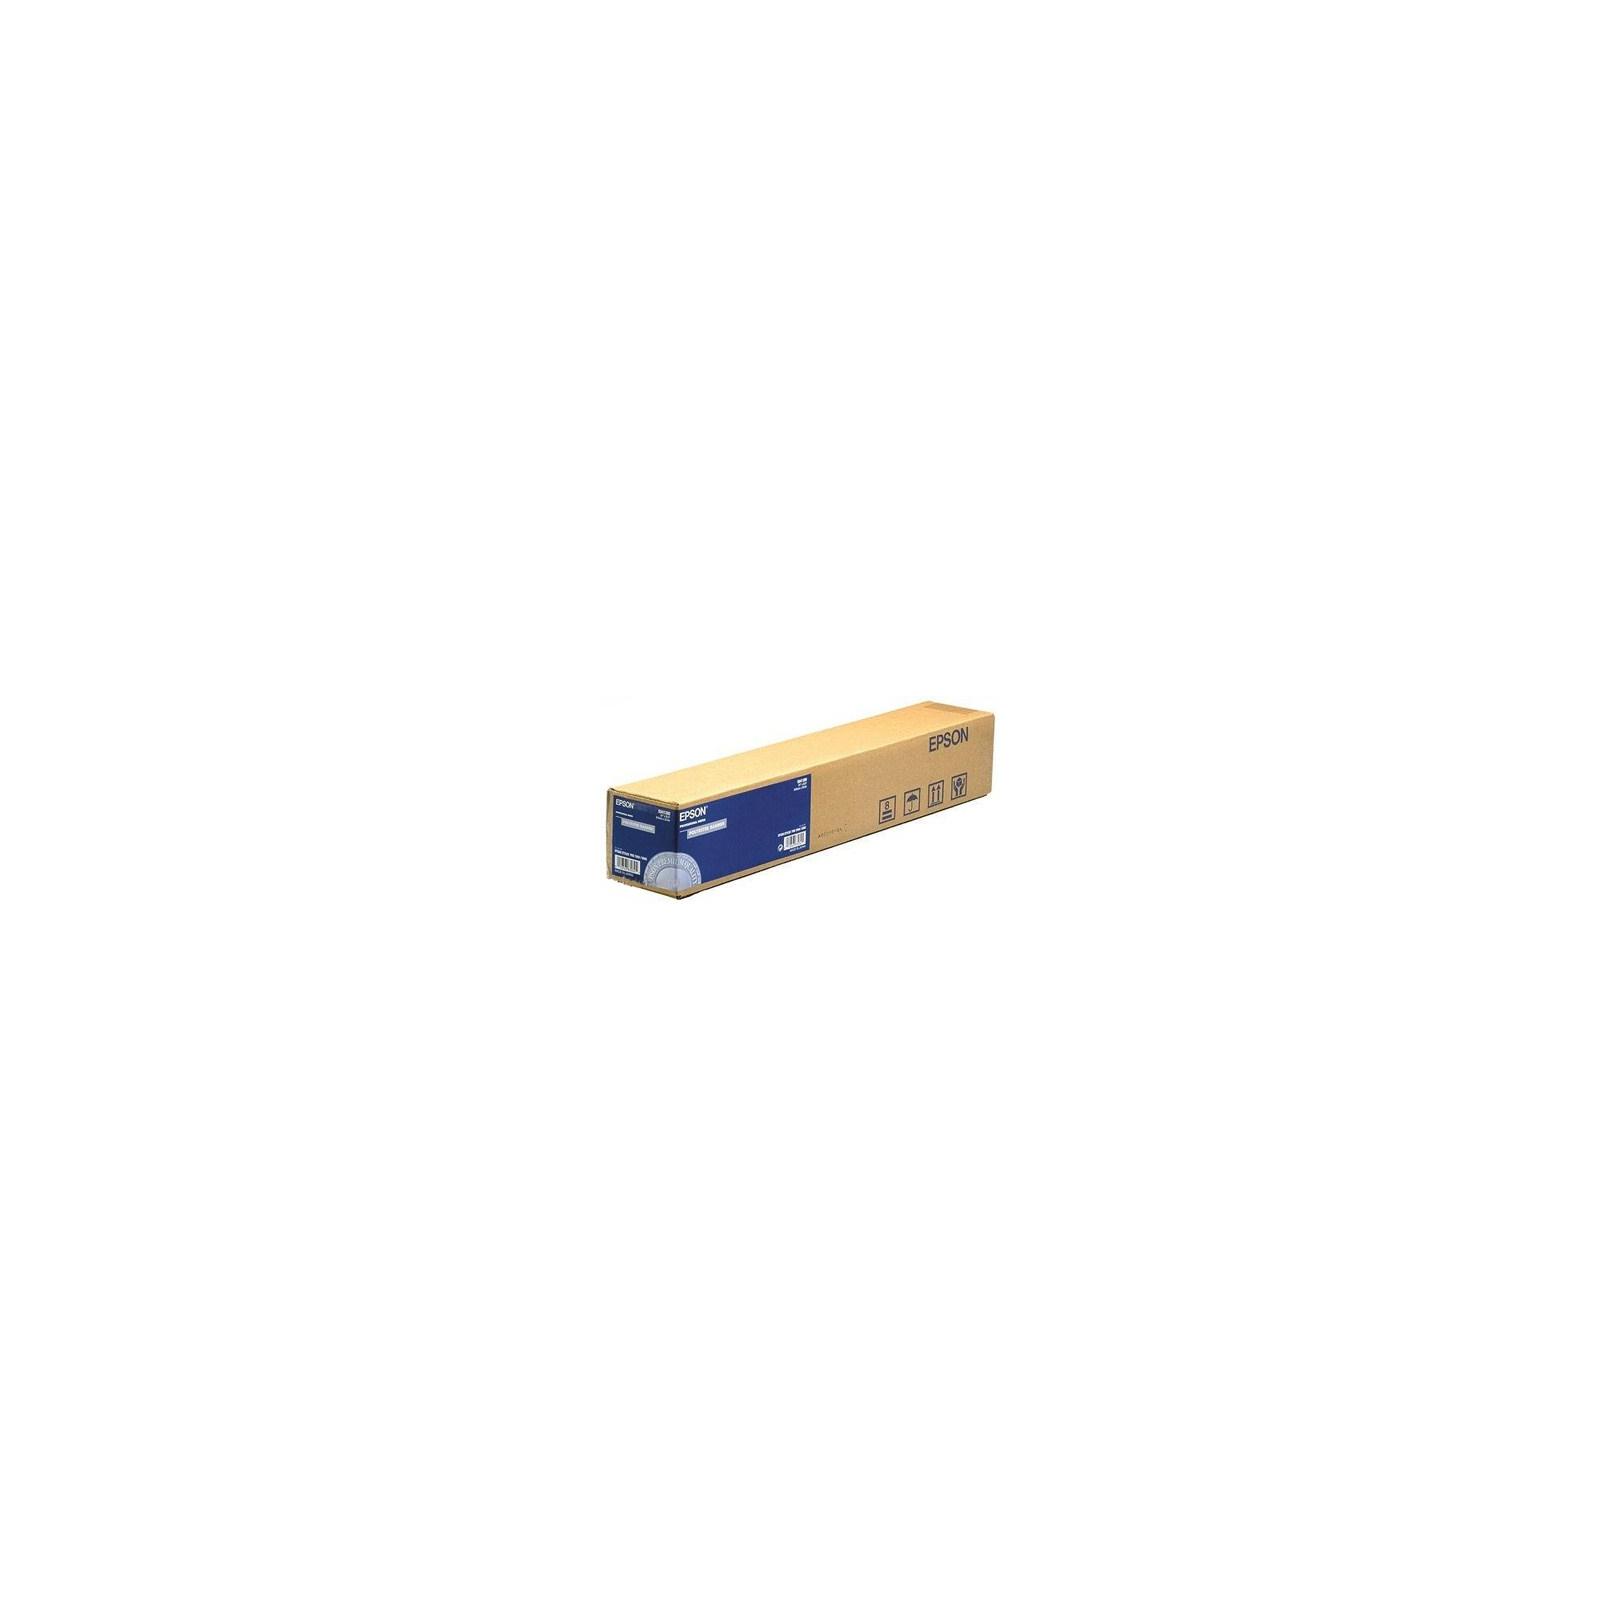 "Бумага EPSON 24"" Presentation Paper HiRes (C13S045291)"